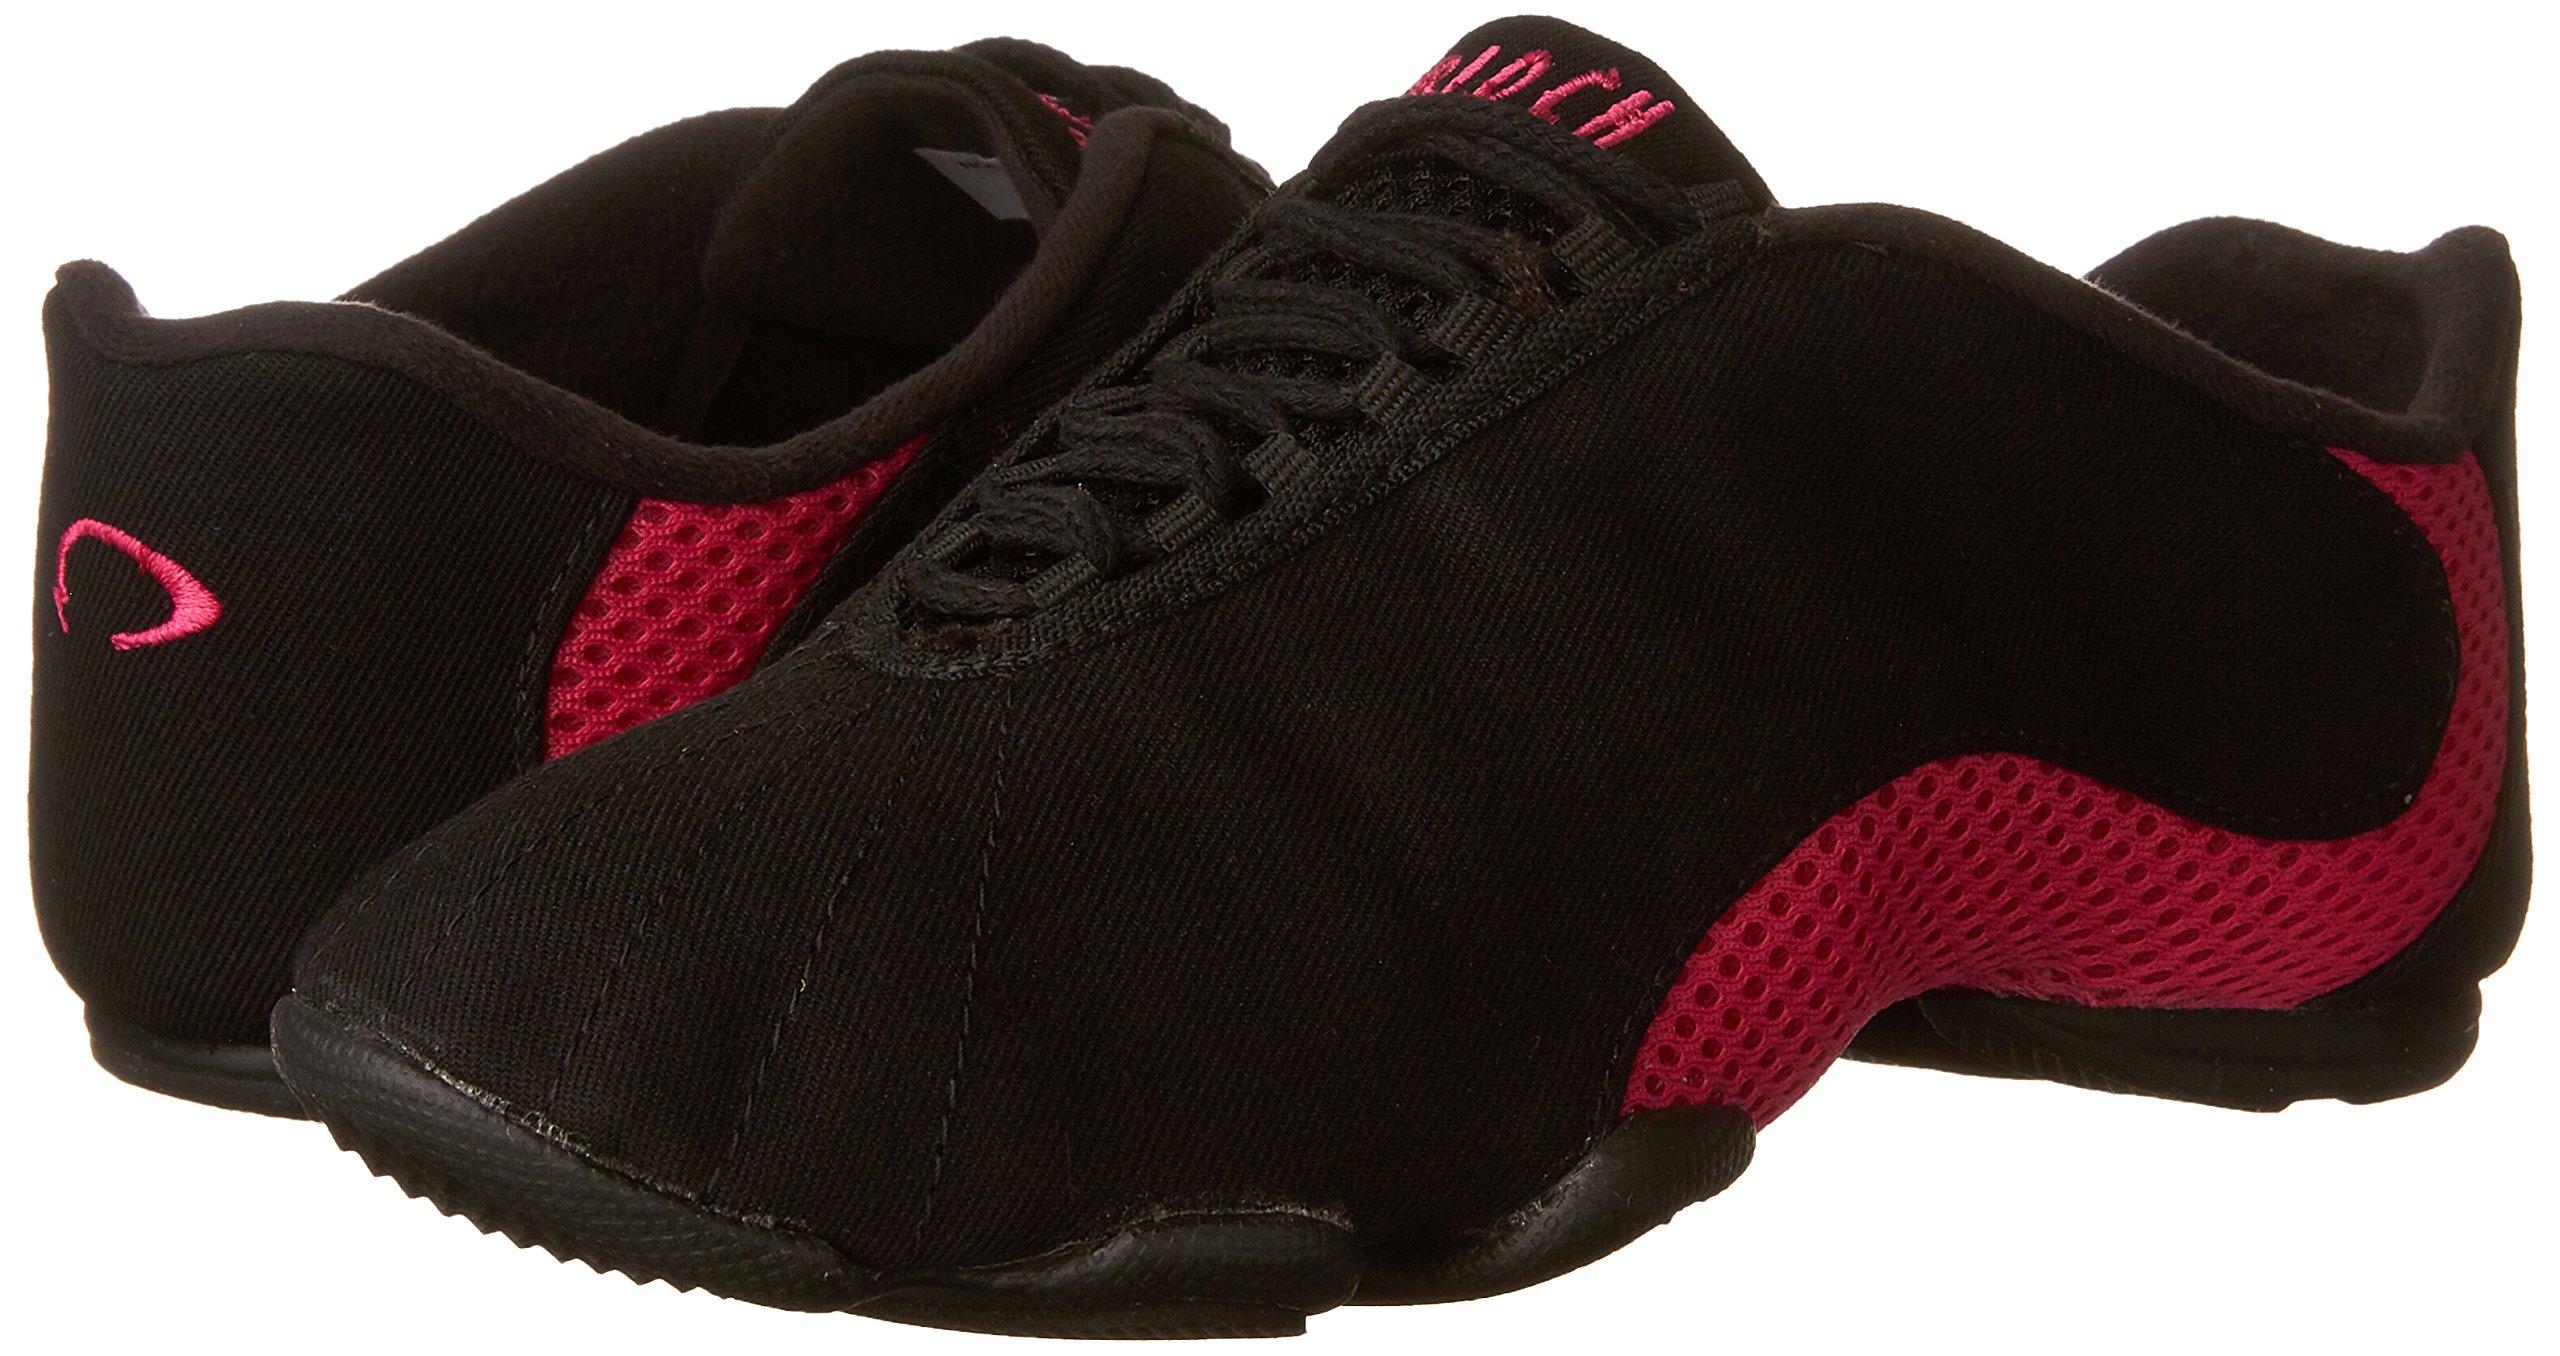 Bloch Dance Women's Amalgam Canvas Dance Sneaker, Hot Pink, 9.5 X(Medium) US by Bloch (Image #6)